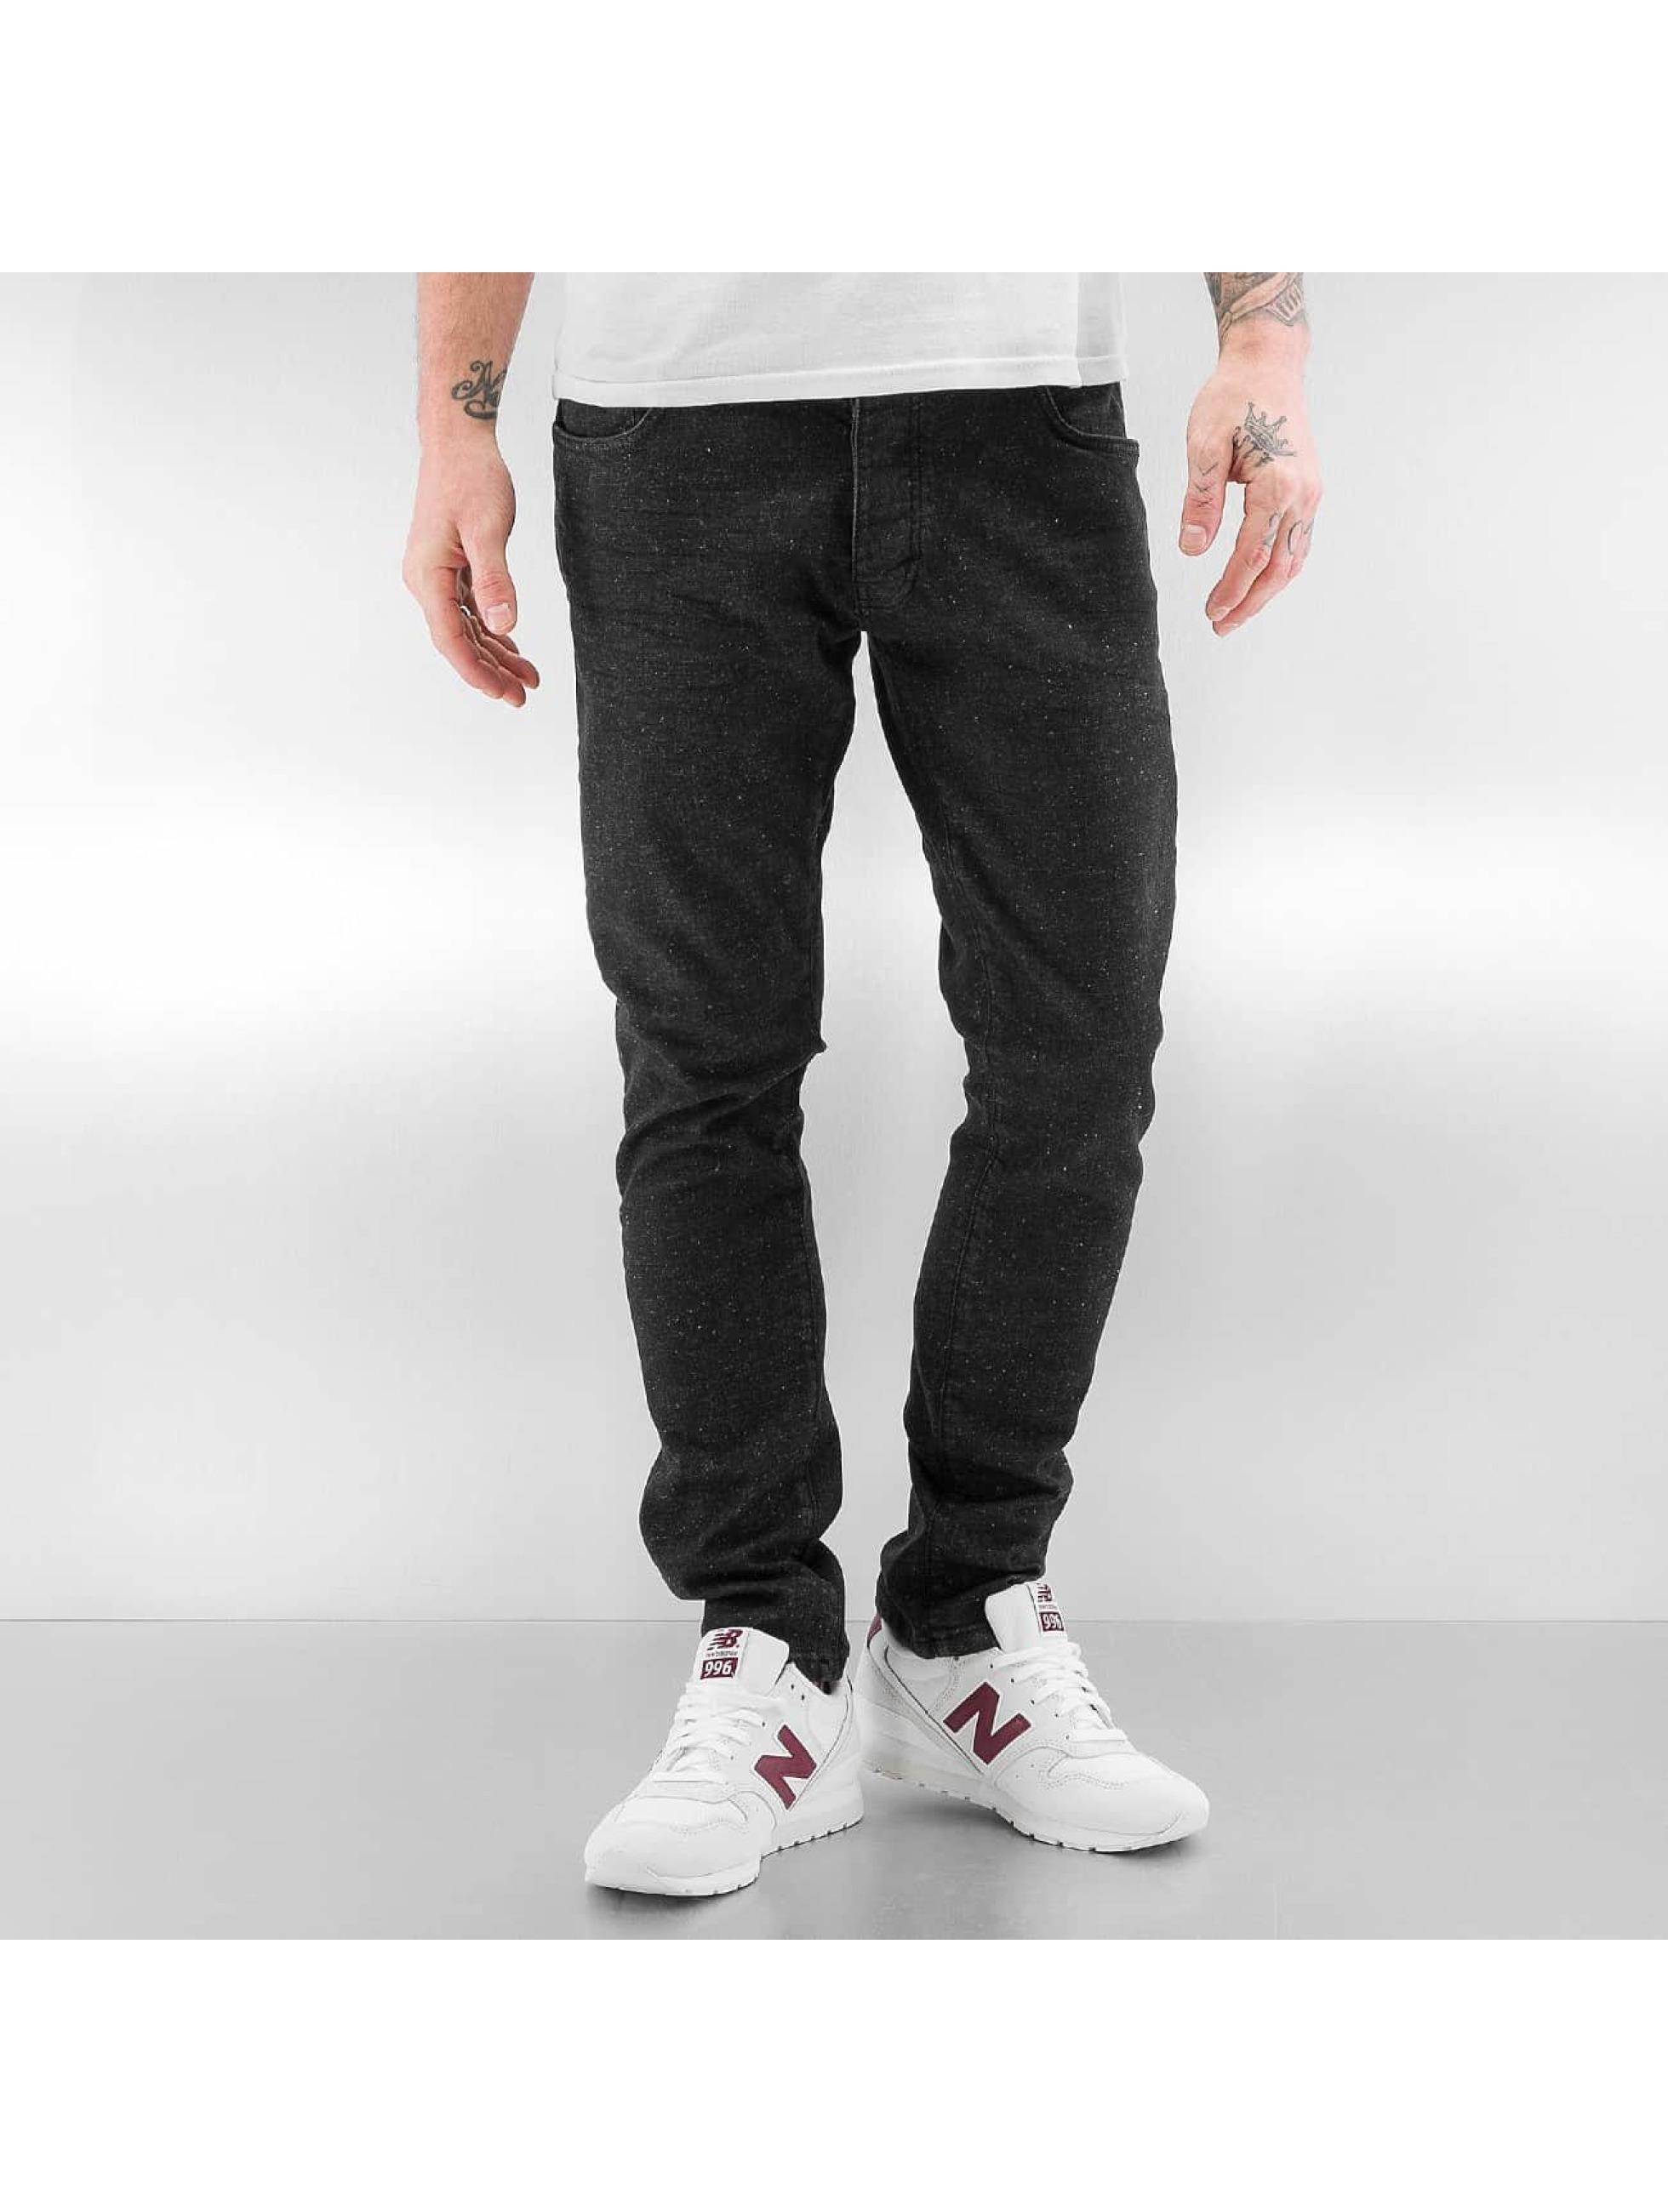 Cyprime Jeans ajustado K100 gris